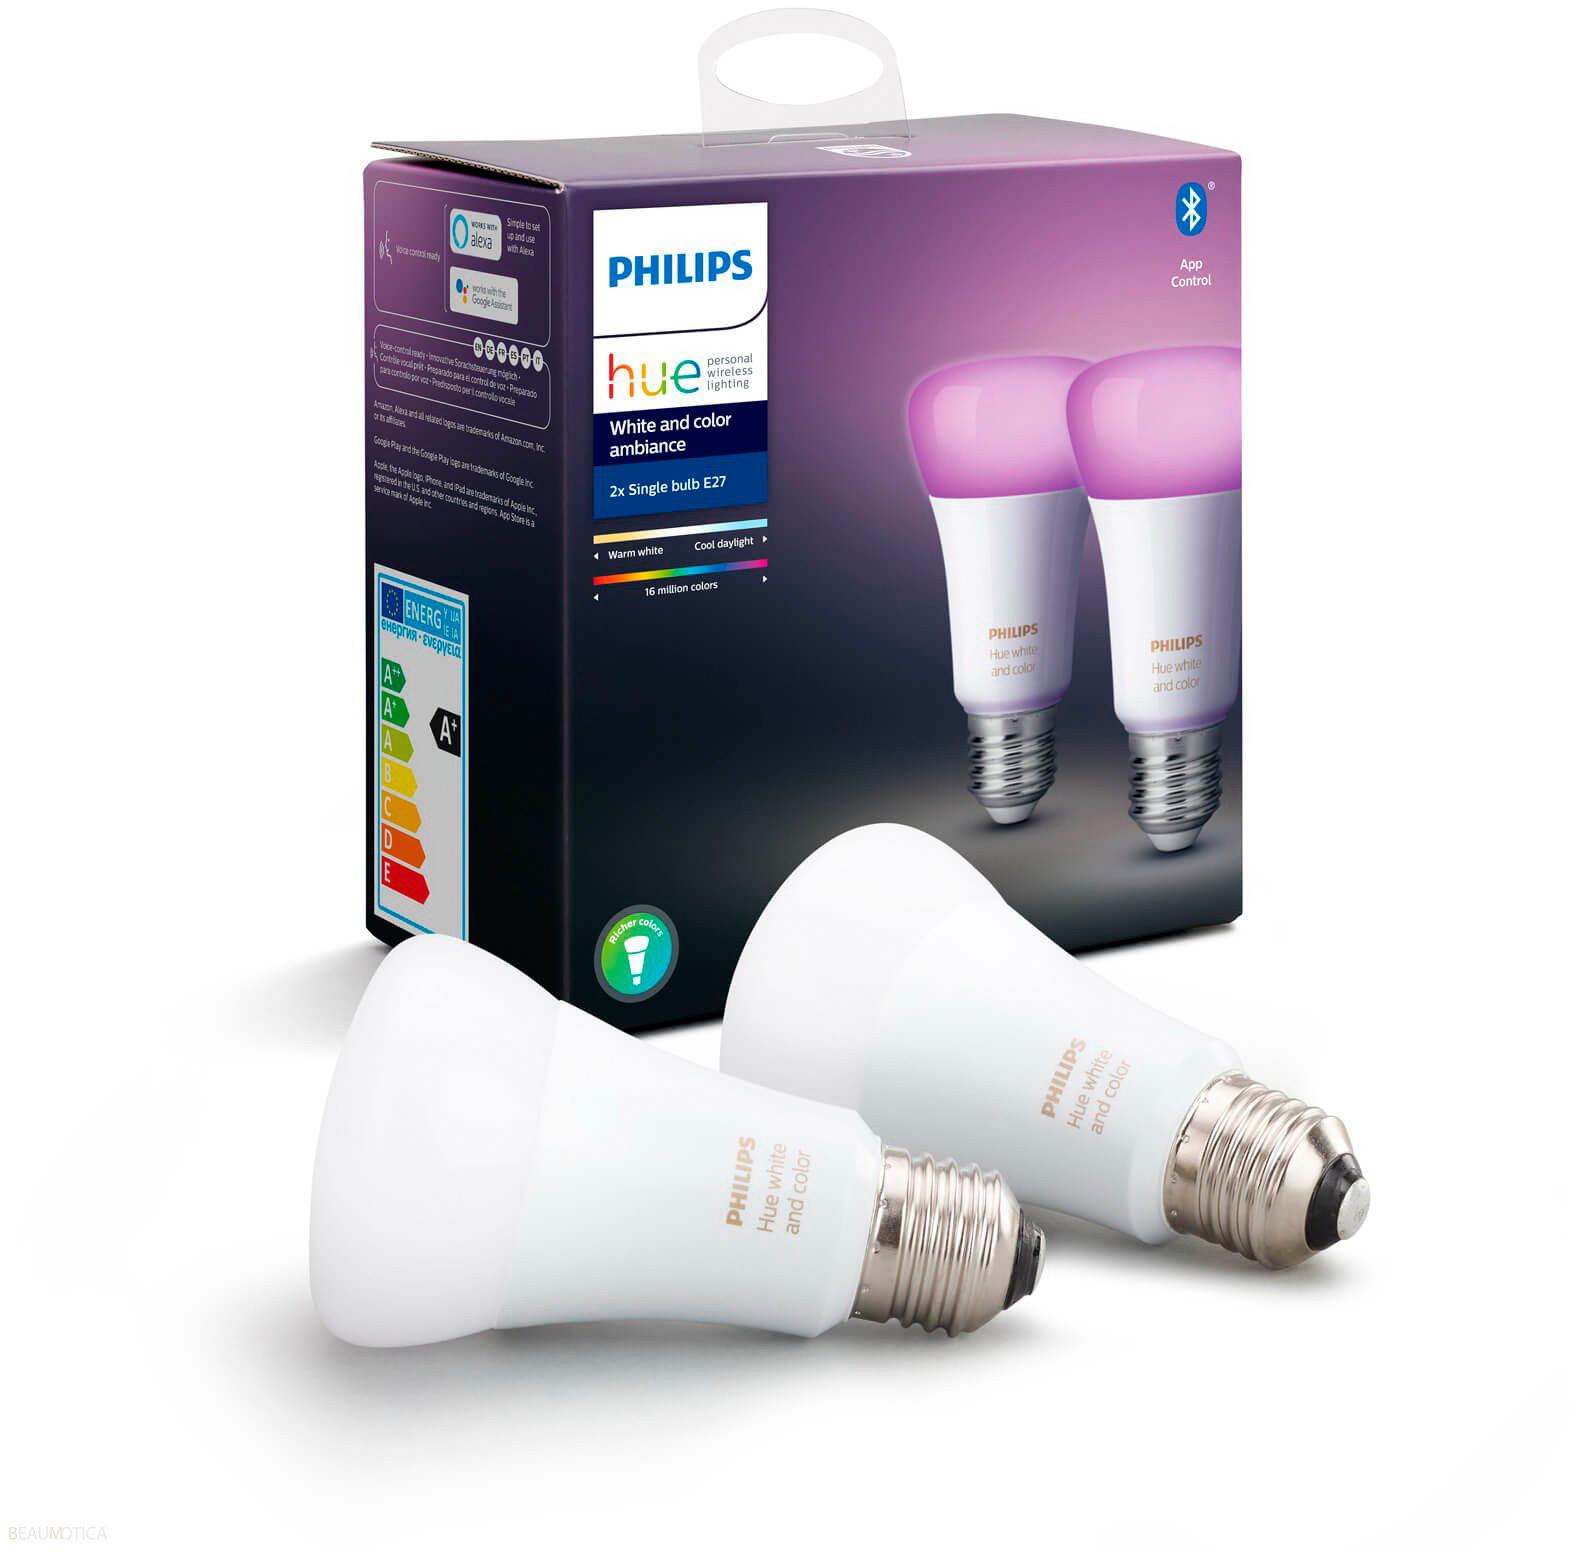 Светодиодные лампы Philips Hue White and Color